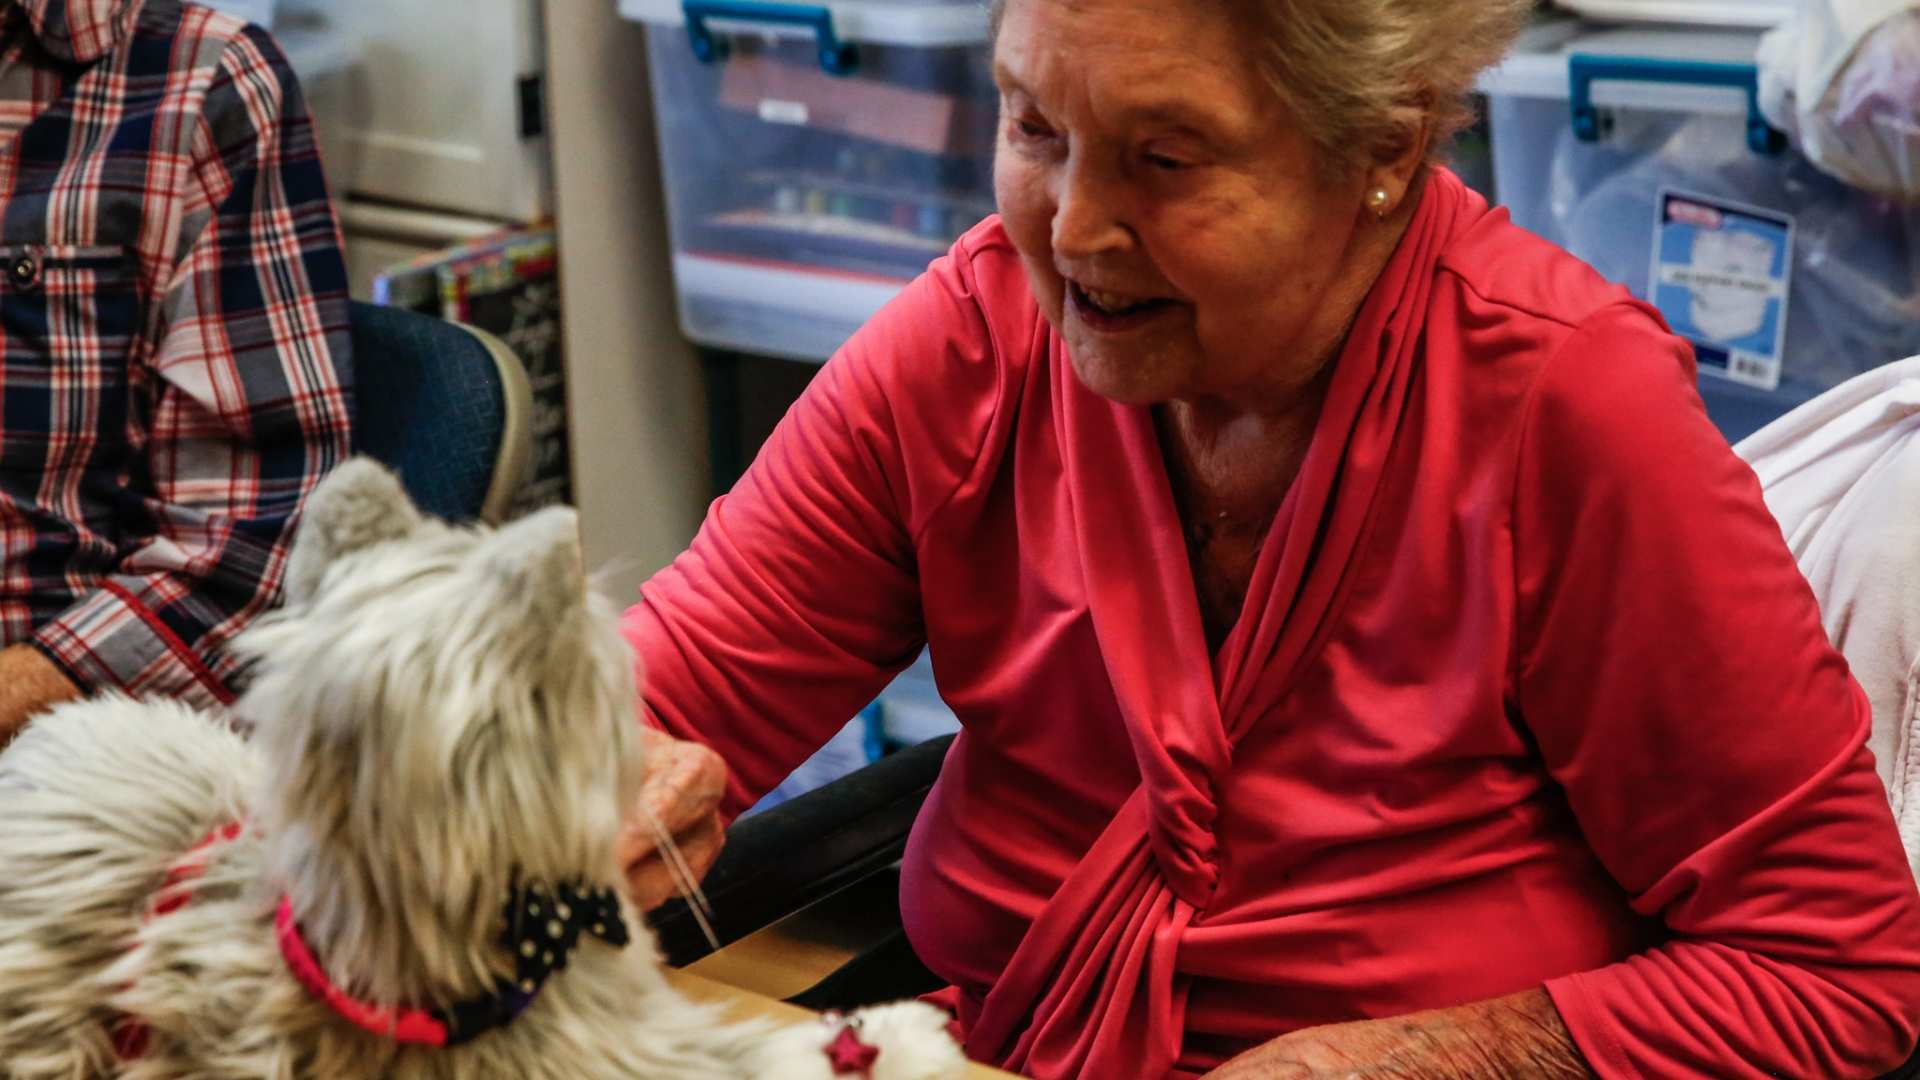 Robotic pets — a memory-impaired senior's best friend